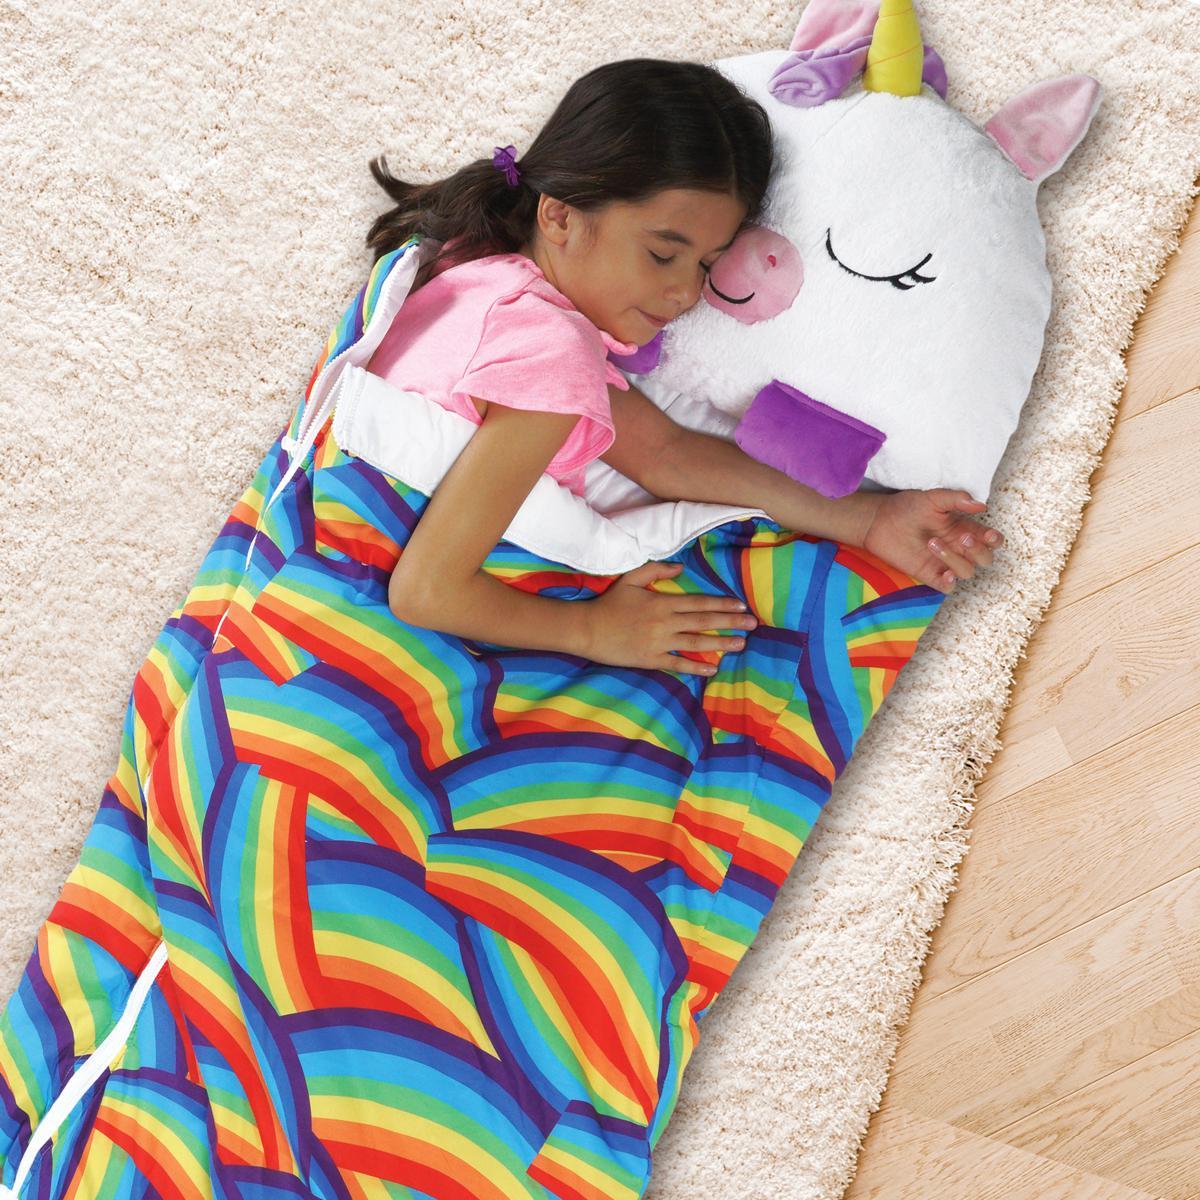 image-Für Nachtschlaf oder Tagesruhe